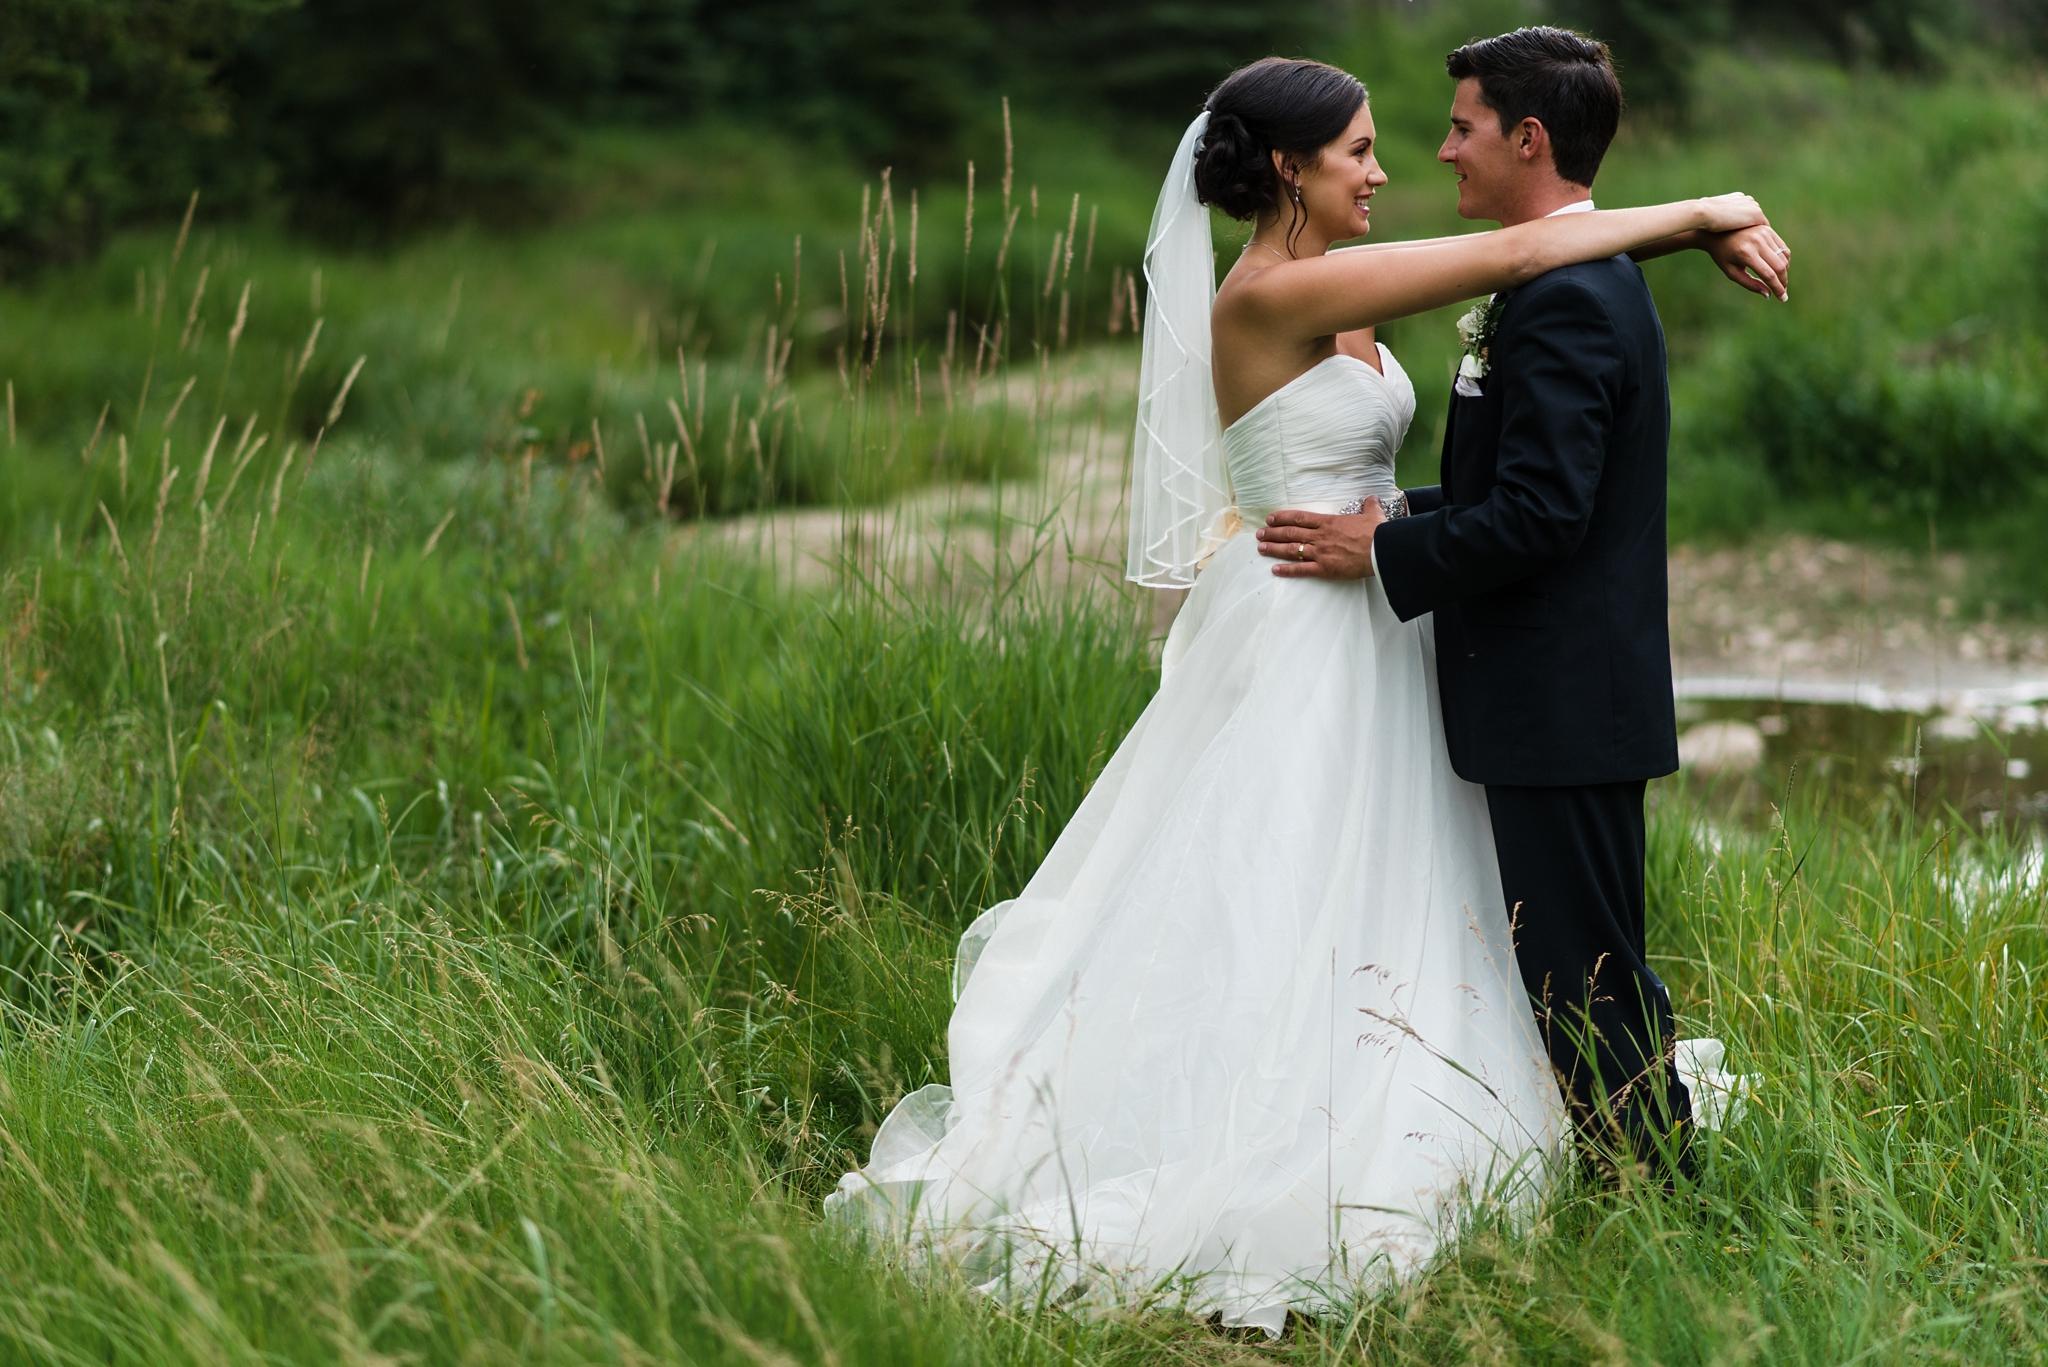 kaihla_tonai_intimate_wedding_elopement_photographer_0104